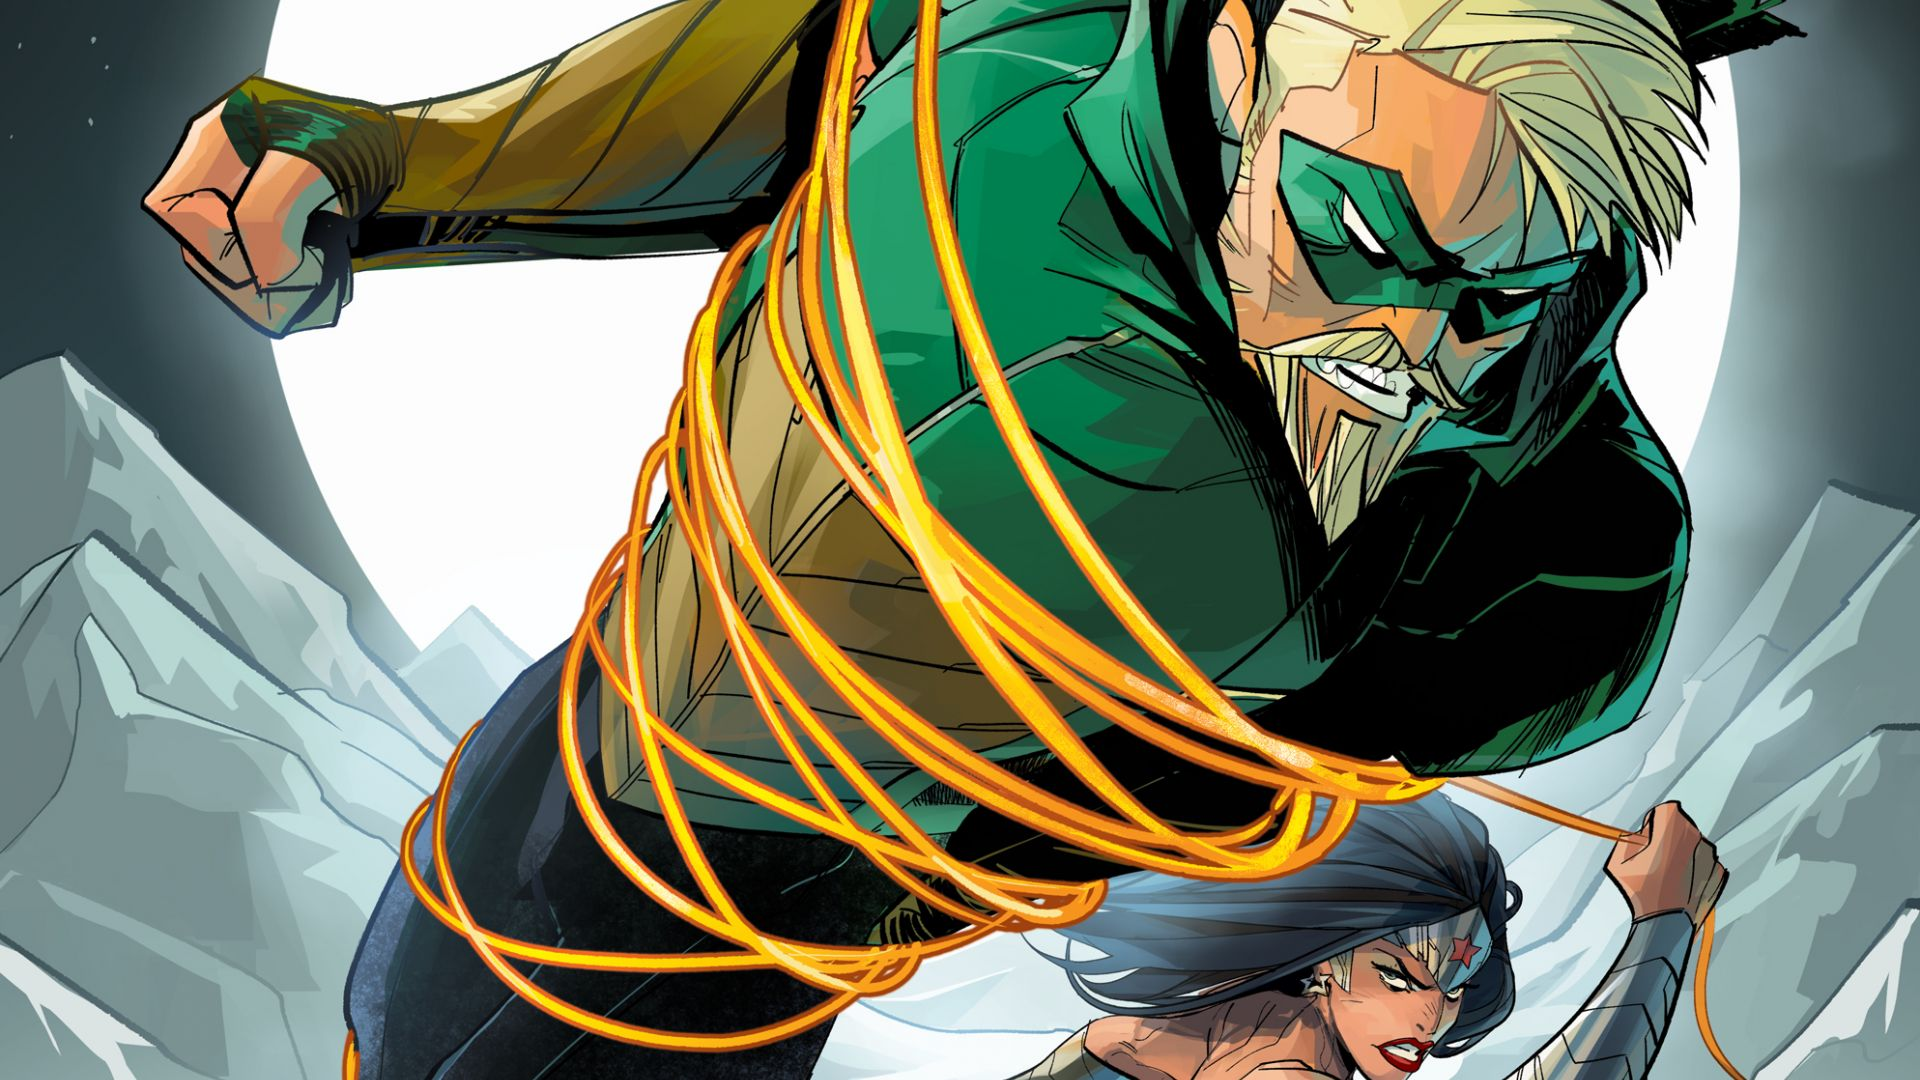 Wonder woman, green arrow, superhero, fight